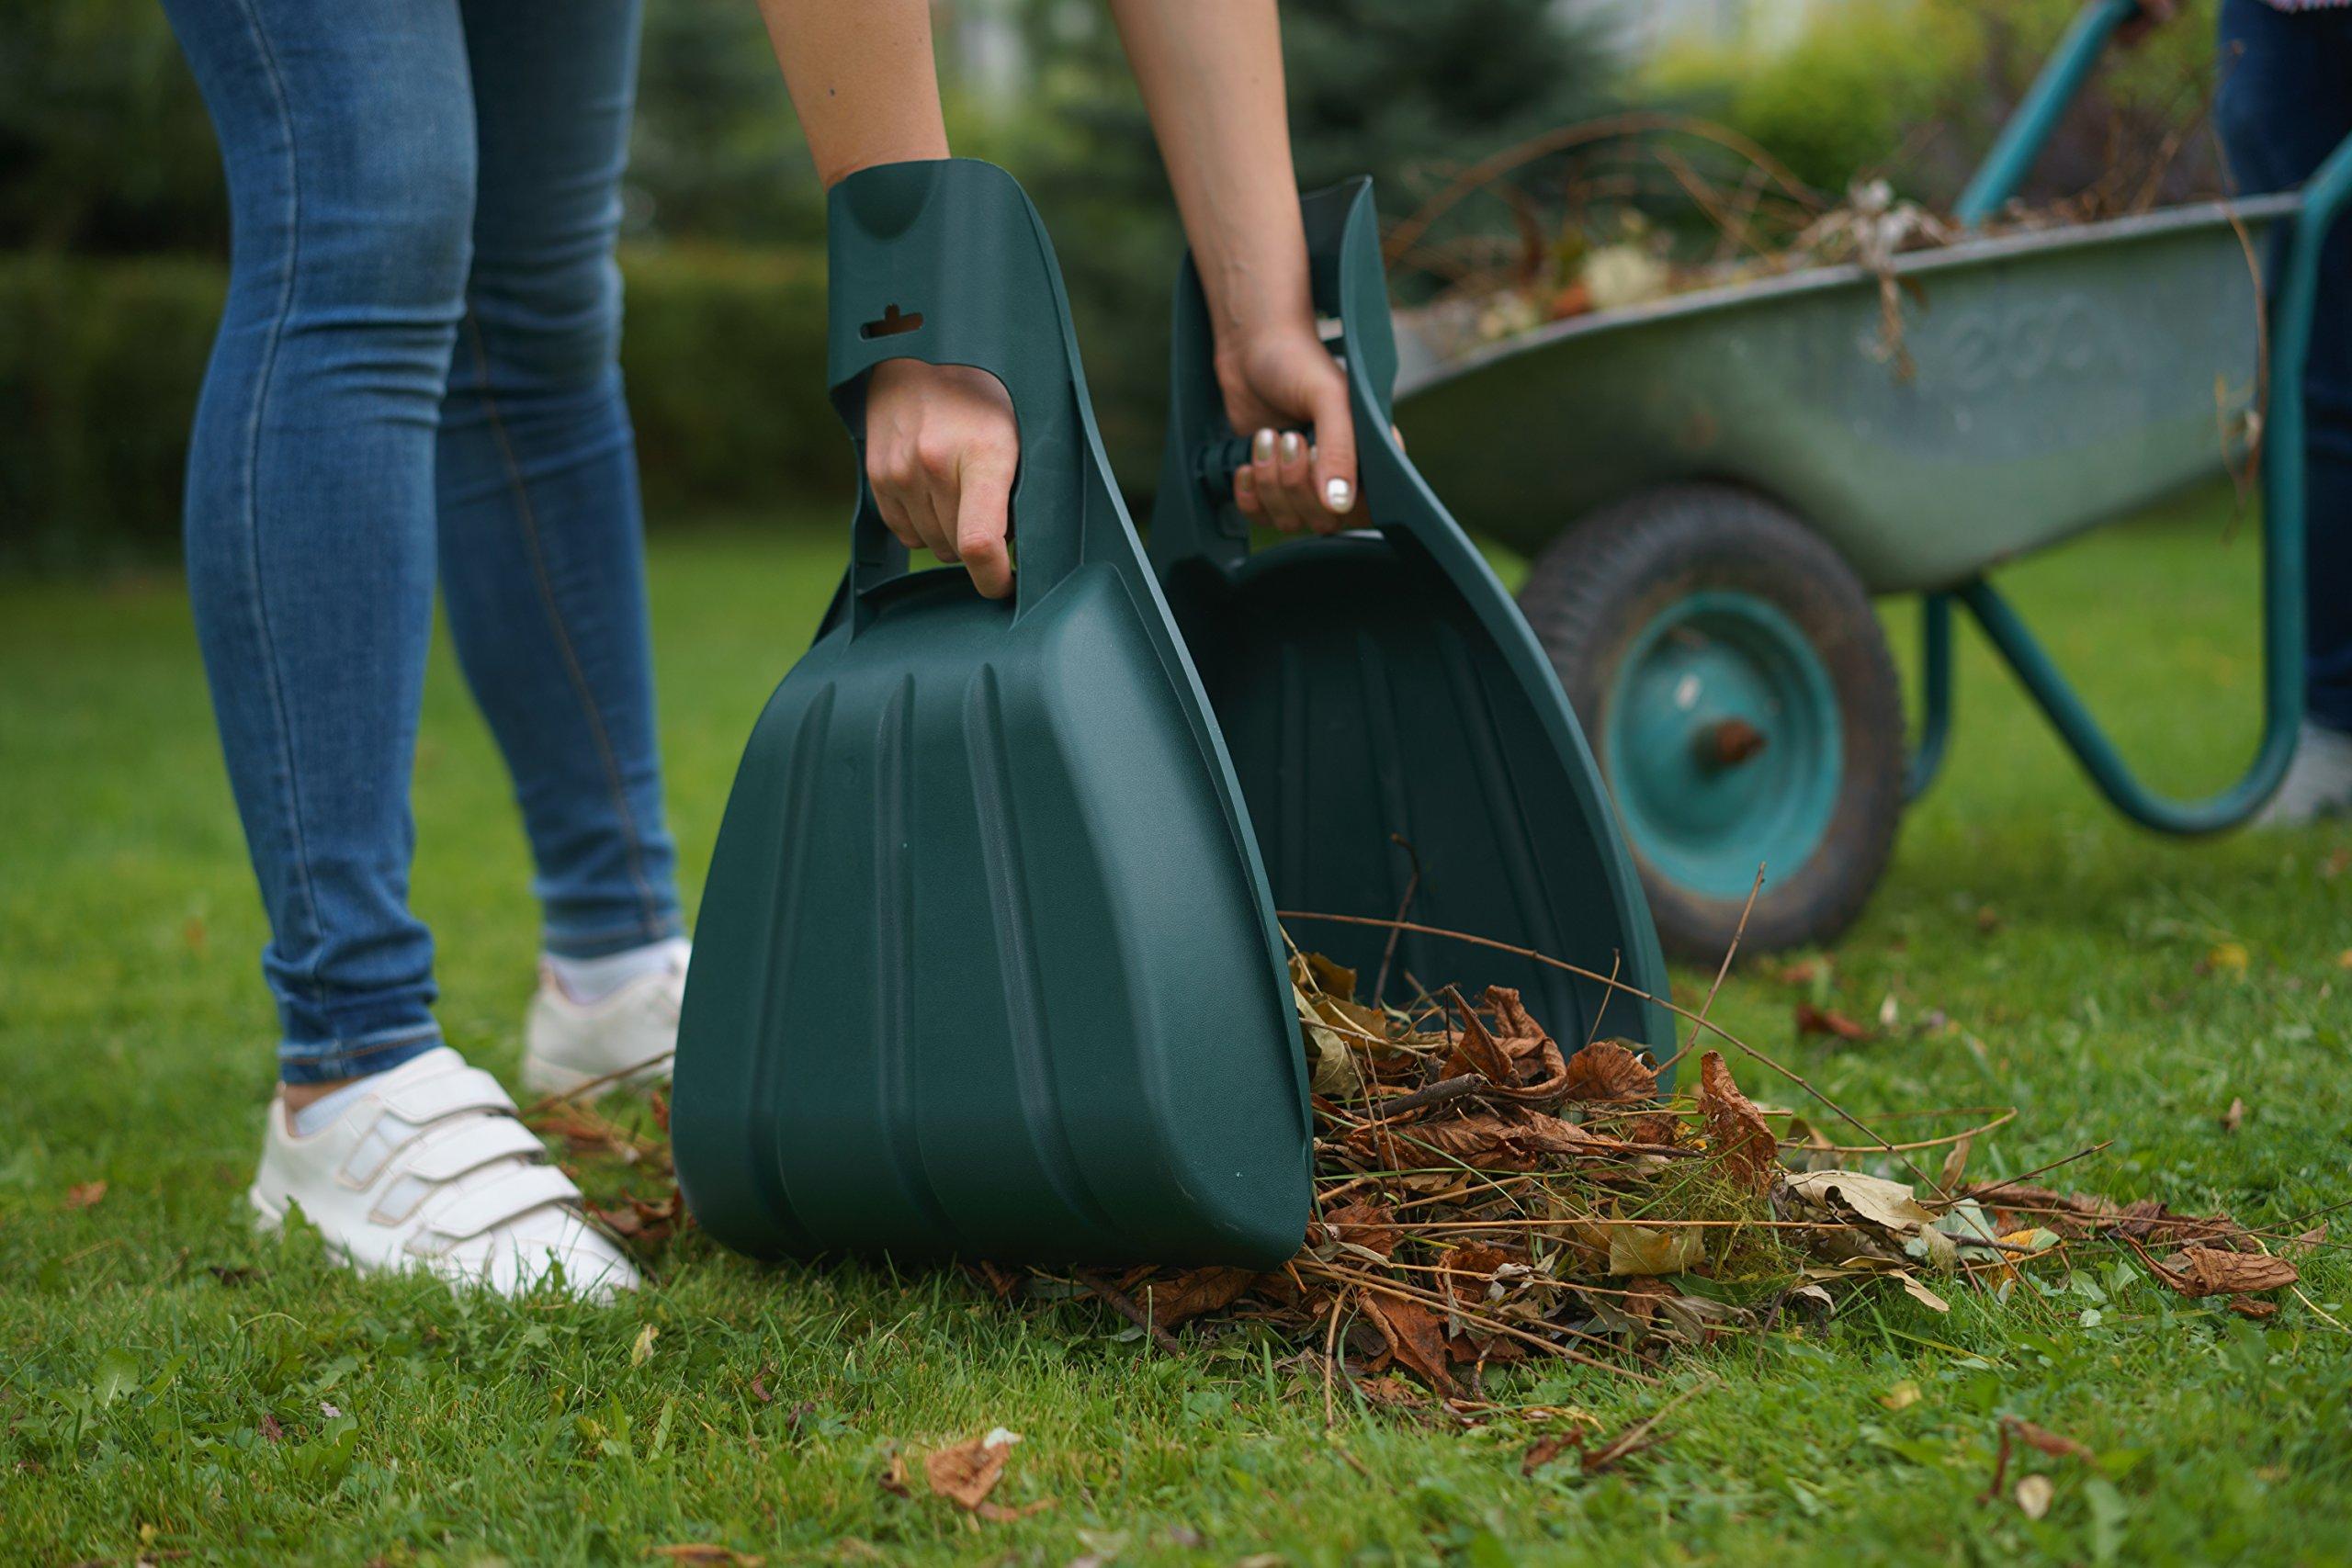 Kenley Leaf Scoops with Collapsible Yard Waste Garbage Bag Composting Bin – Leaf Hand Rakes for Leaves Grass Debris - Grabber Picker Tool for Garden or Lawn with Pop Up Composting Garbage Bag by Kenley (Image #7)